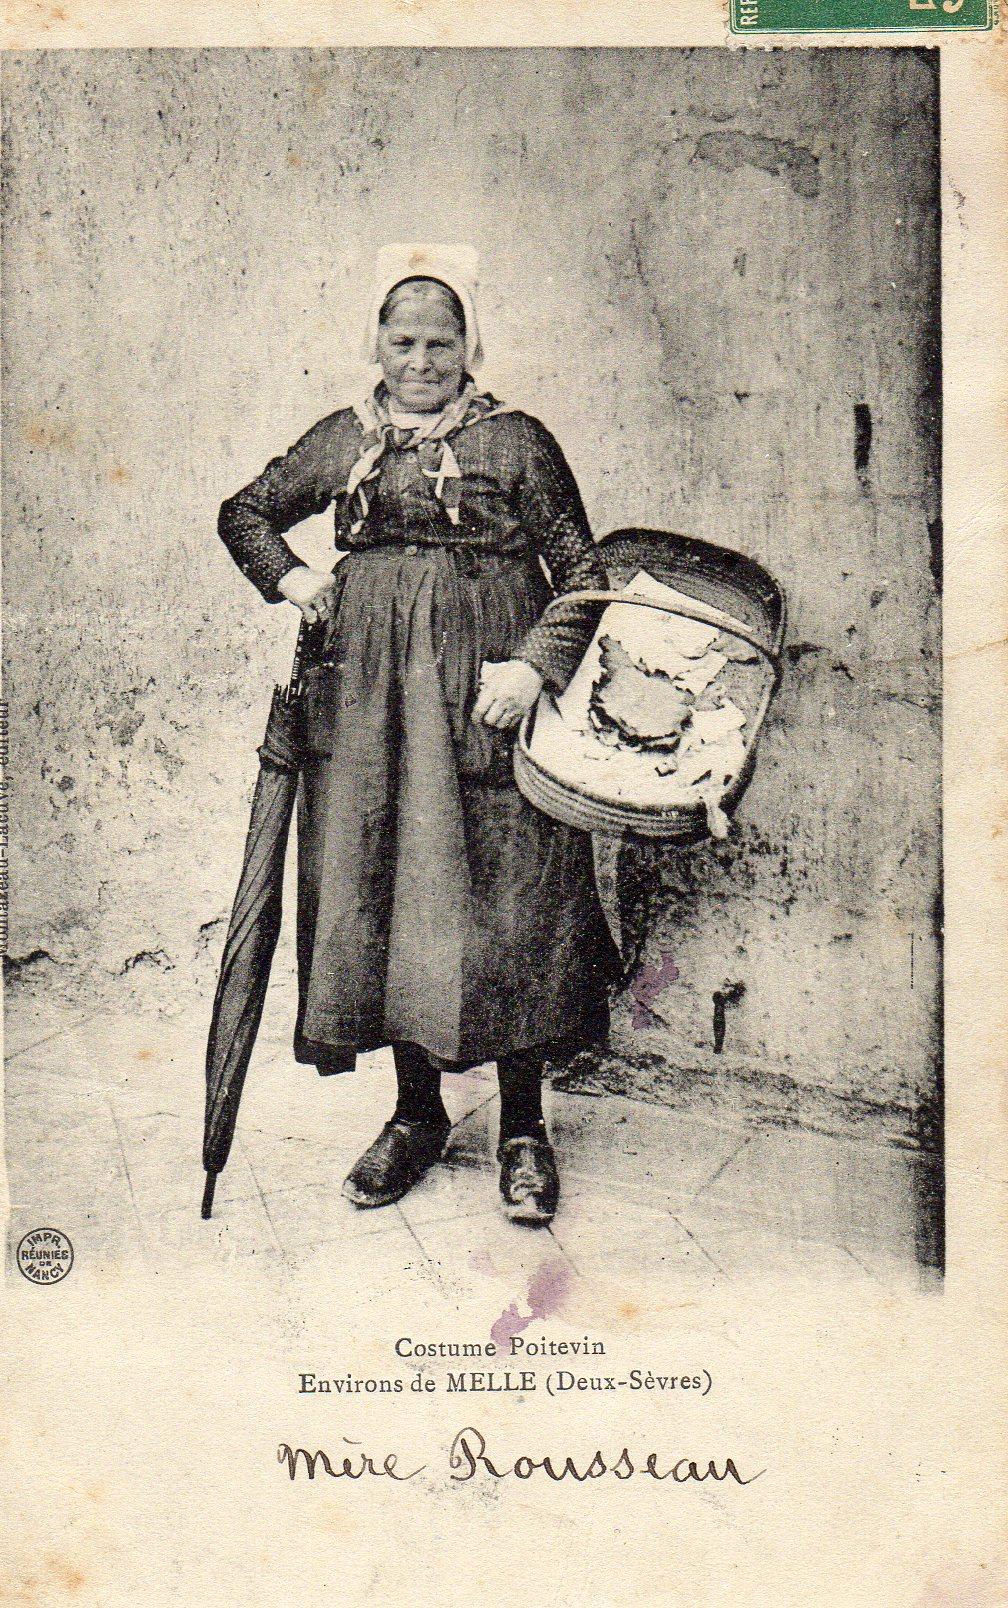 Costume poitevin Mère Rousseau.jpg